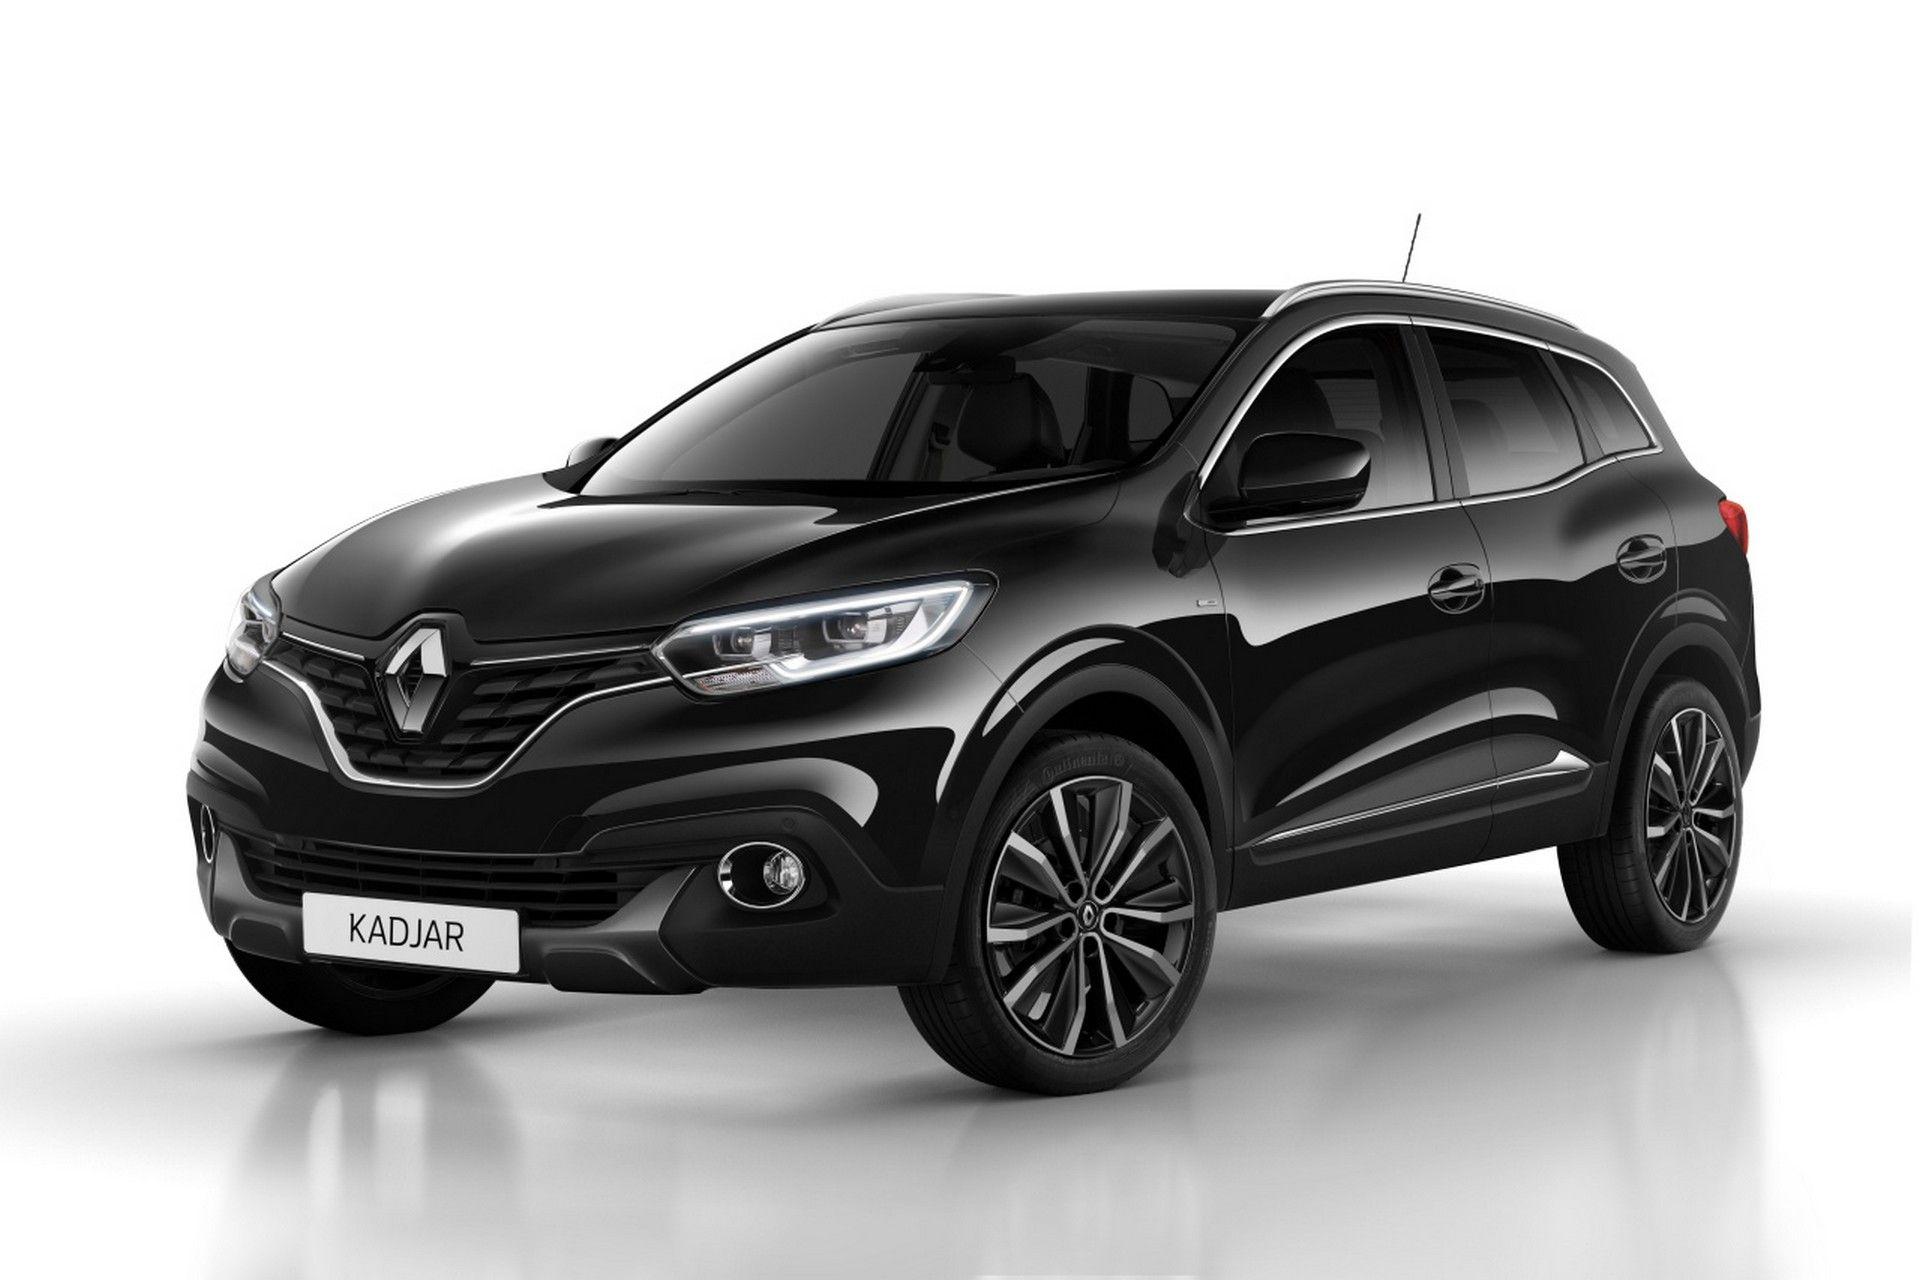 2020 Renault Kadjar Release Date Renault Upcoming Cars Black Edition